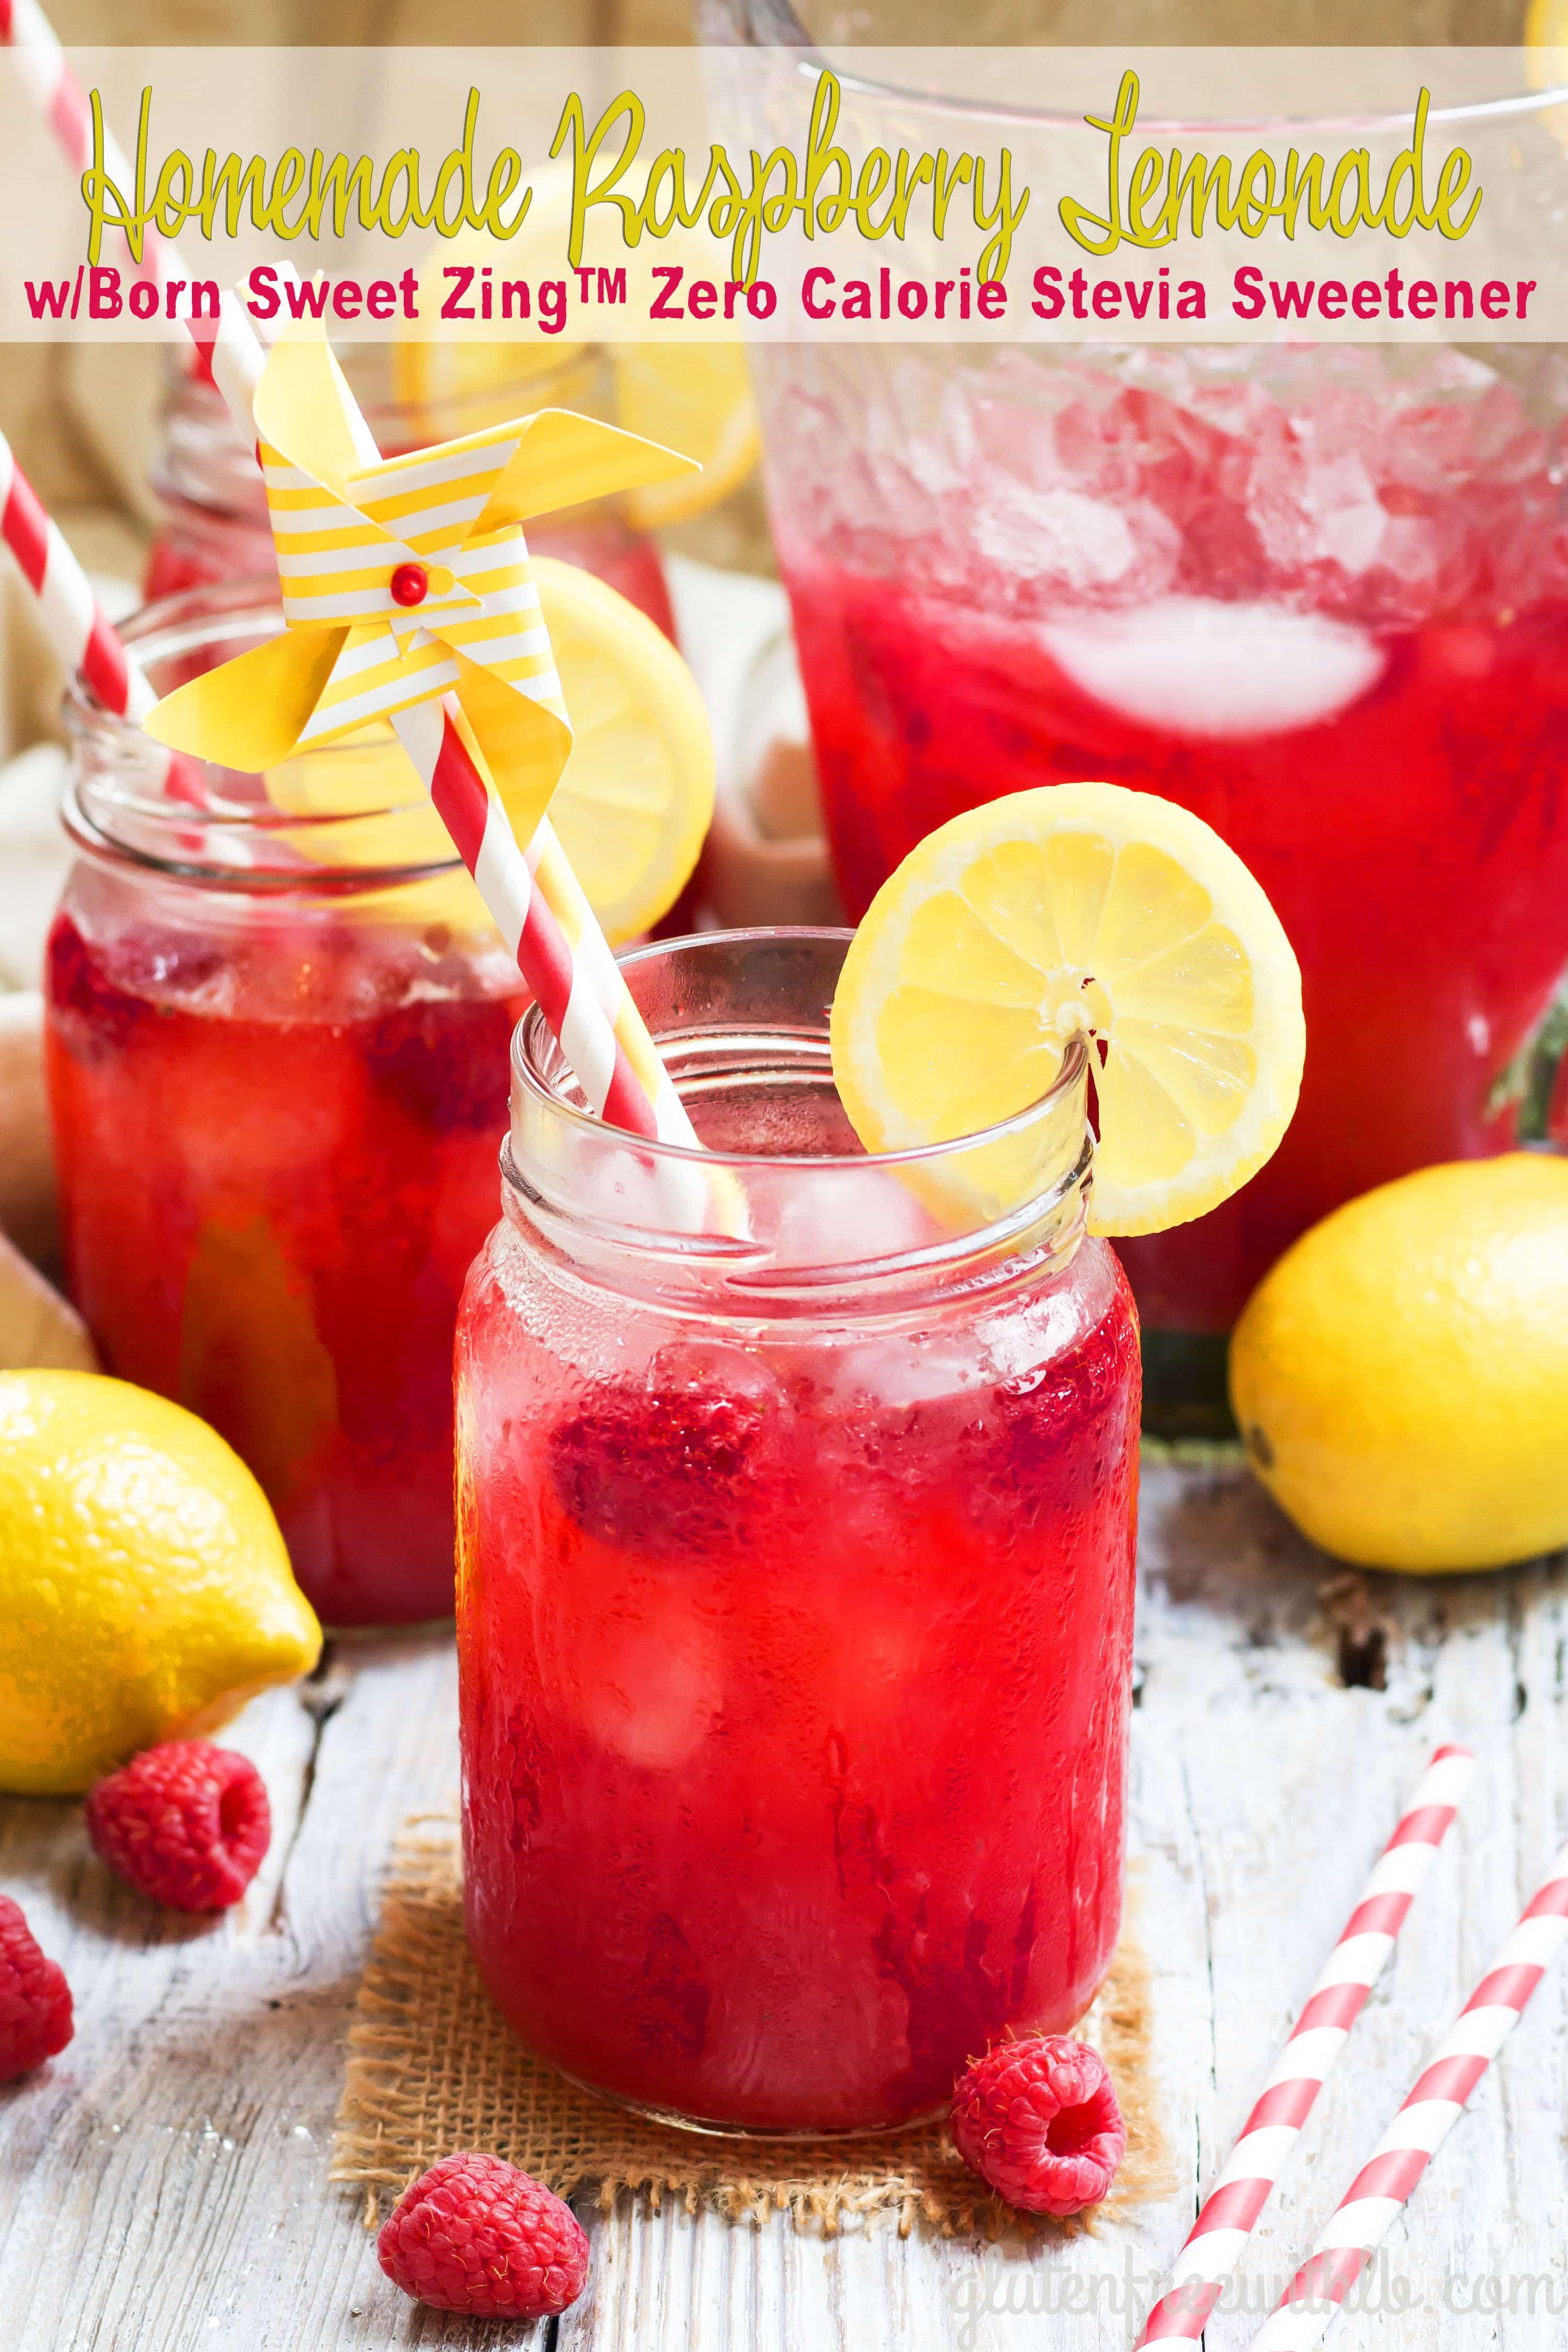 Homemade Raspberry Lemonade w/ Born Sweet Zing™ Stevia Sweetener